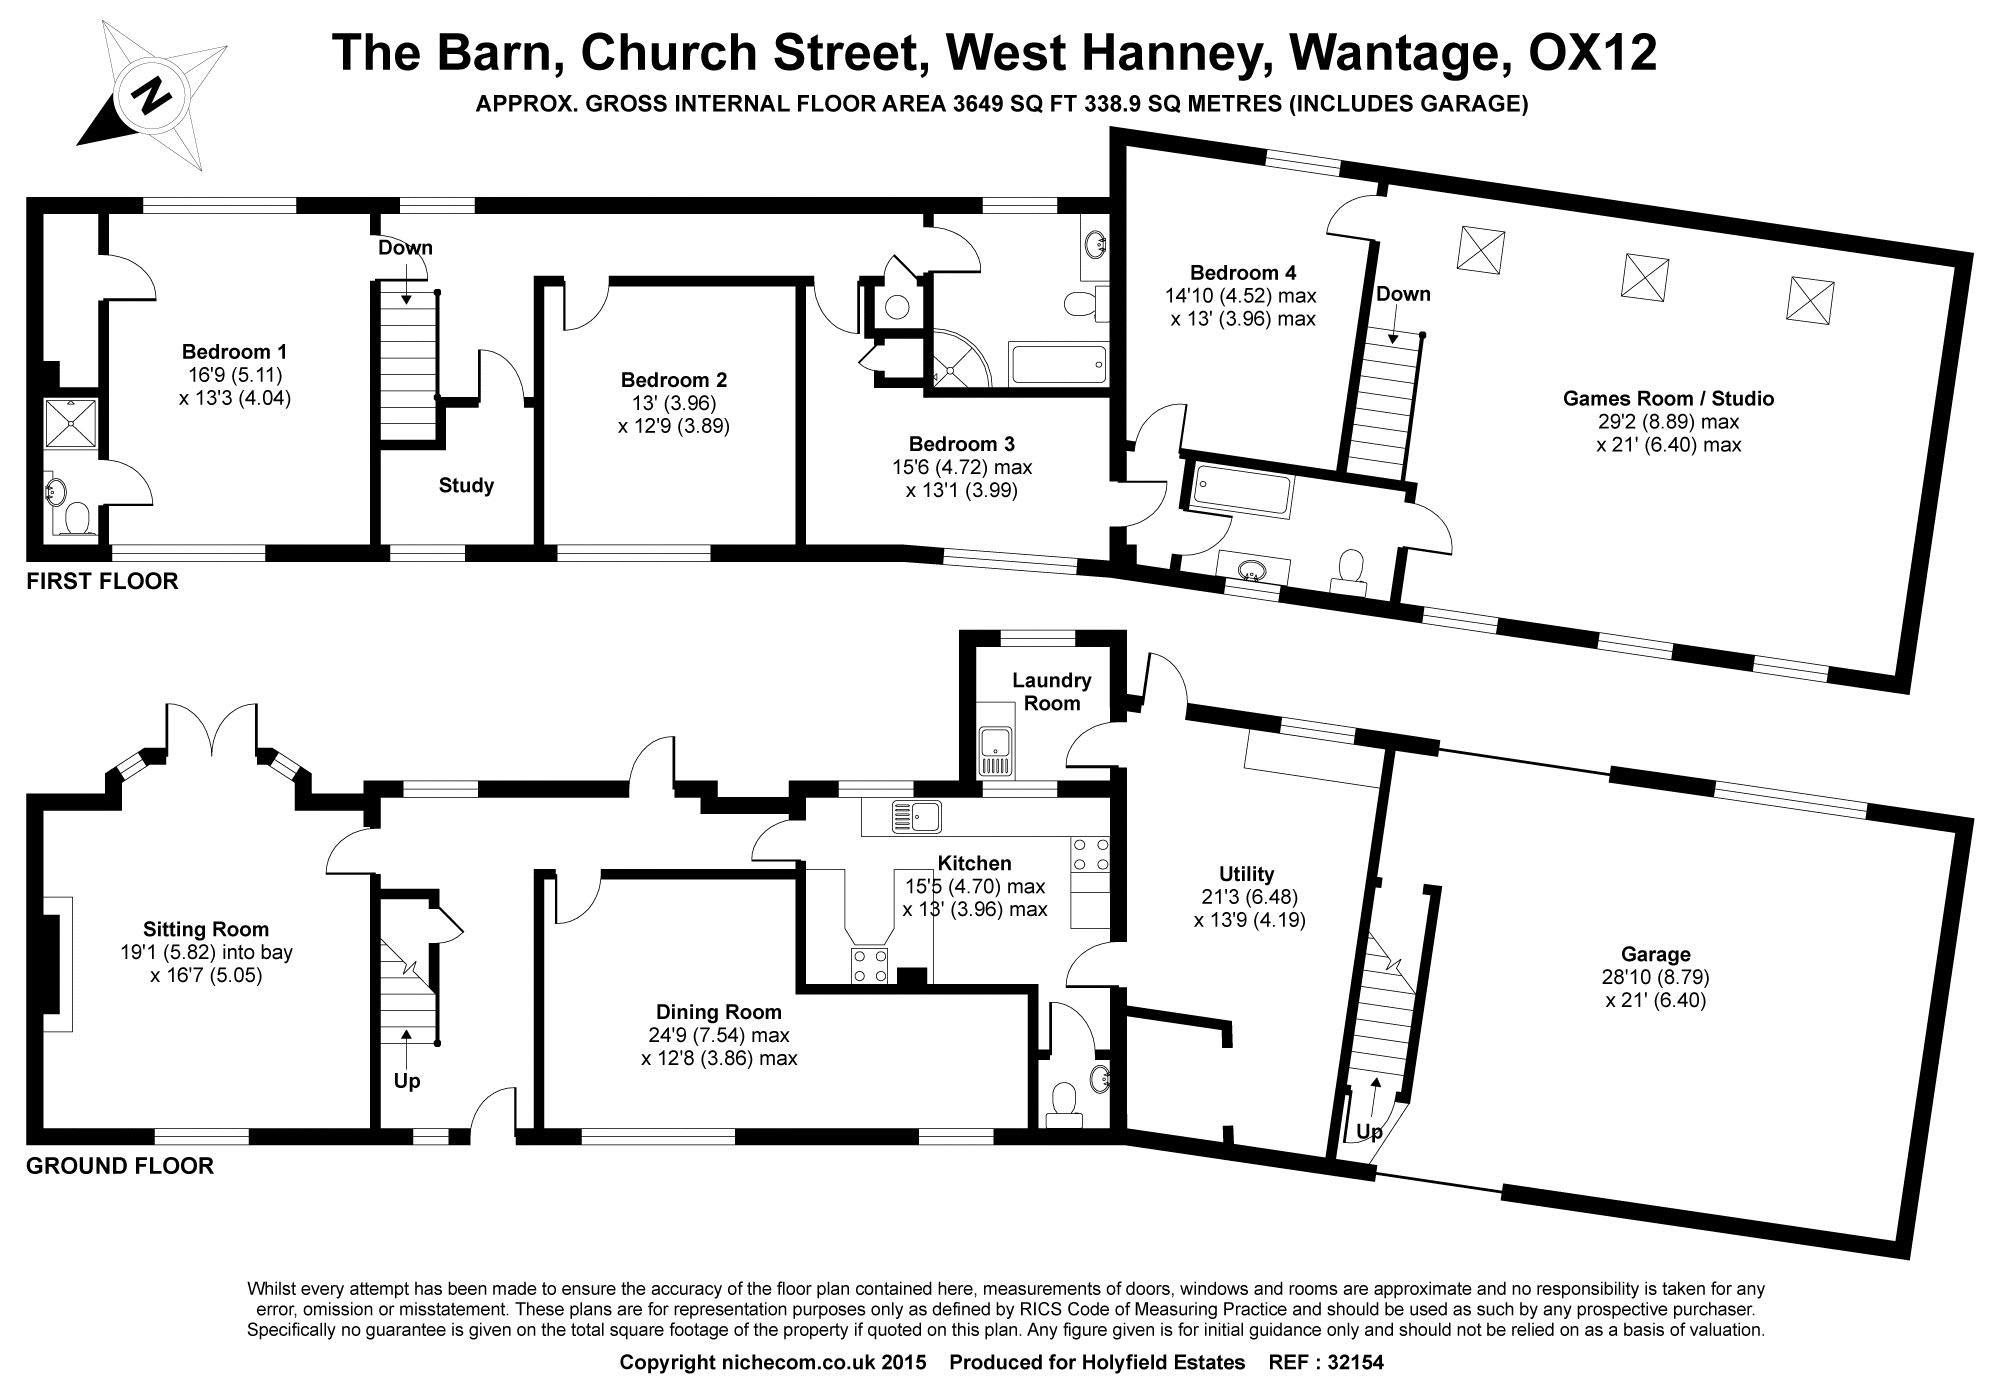 Church Street, West Hanney